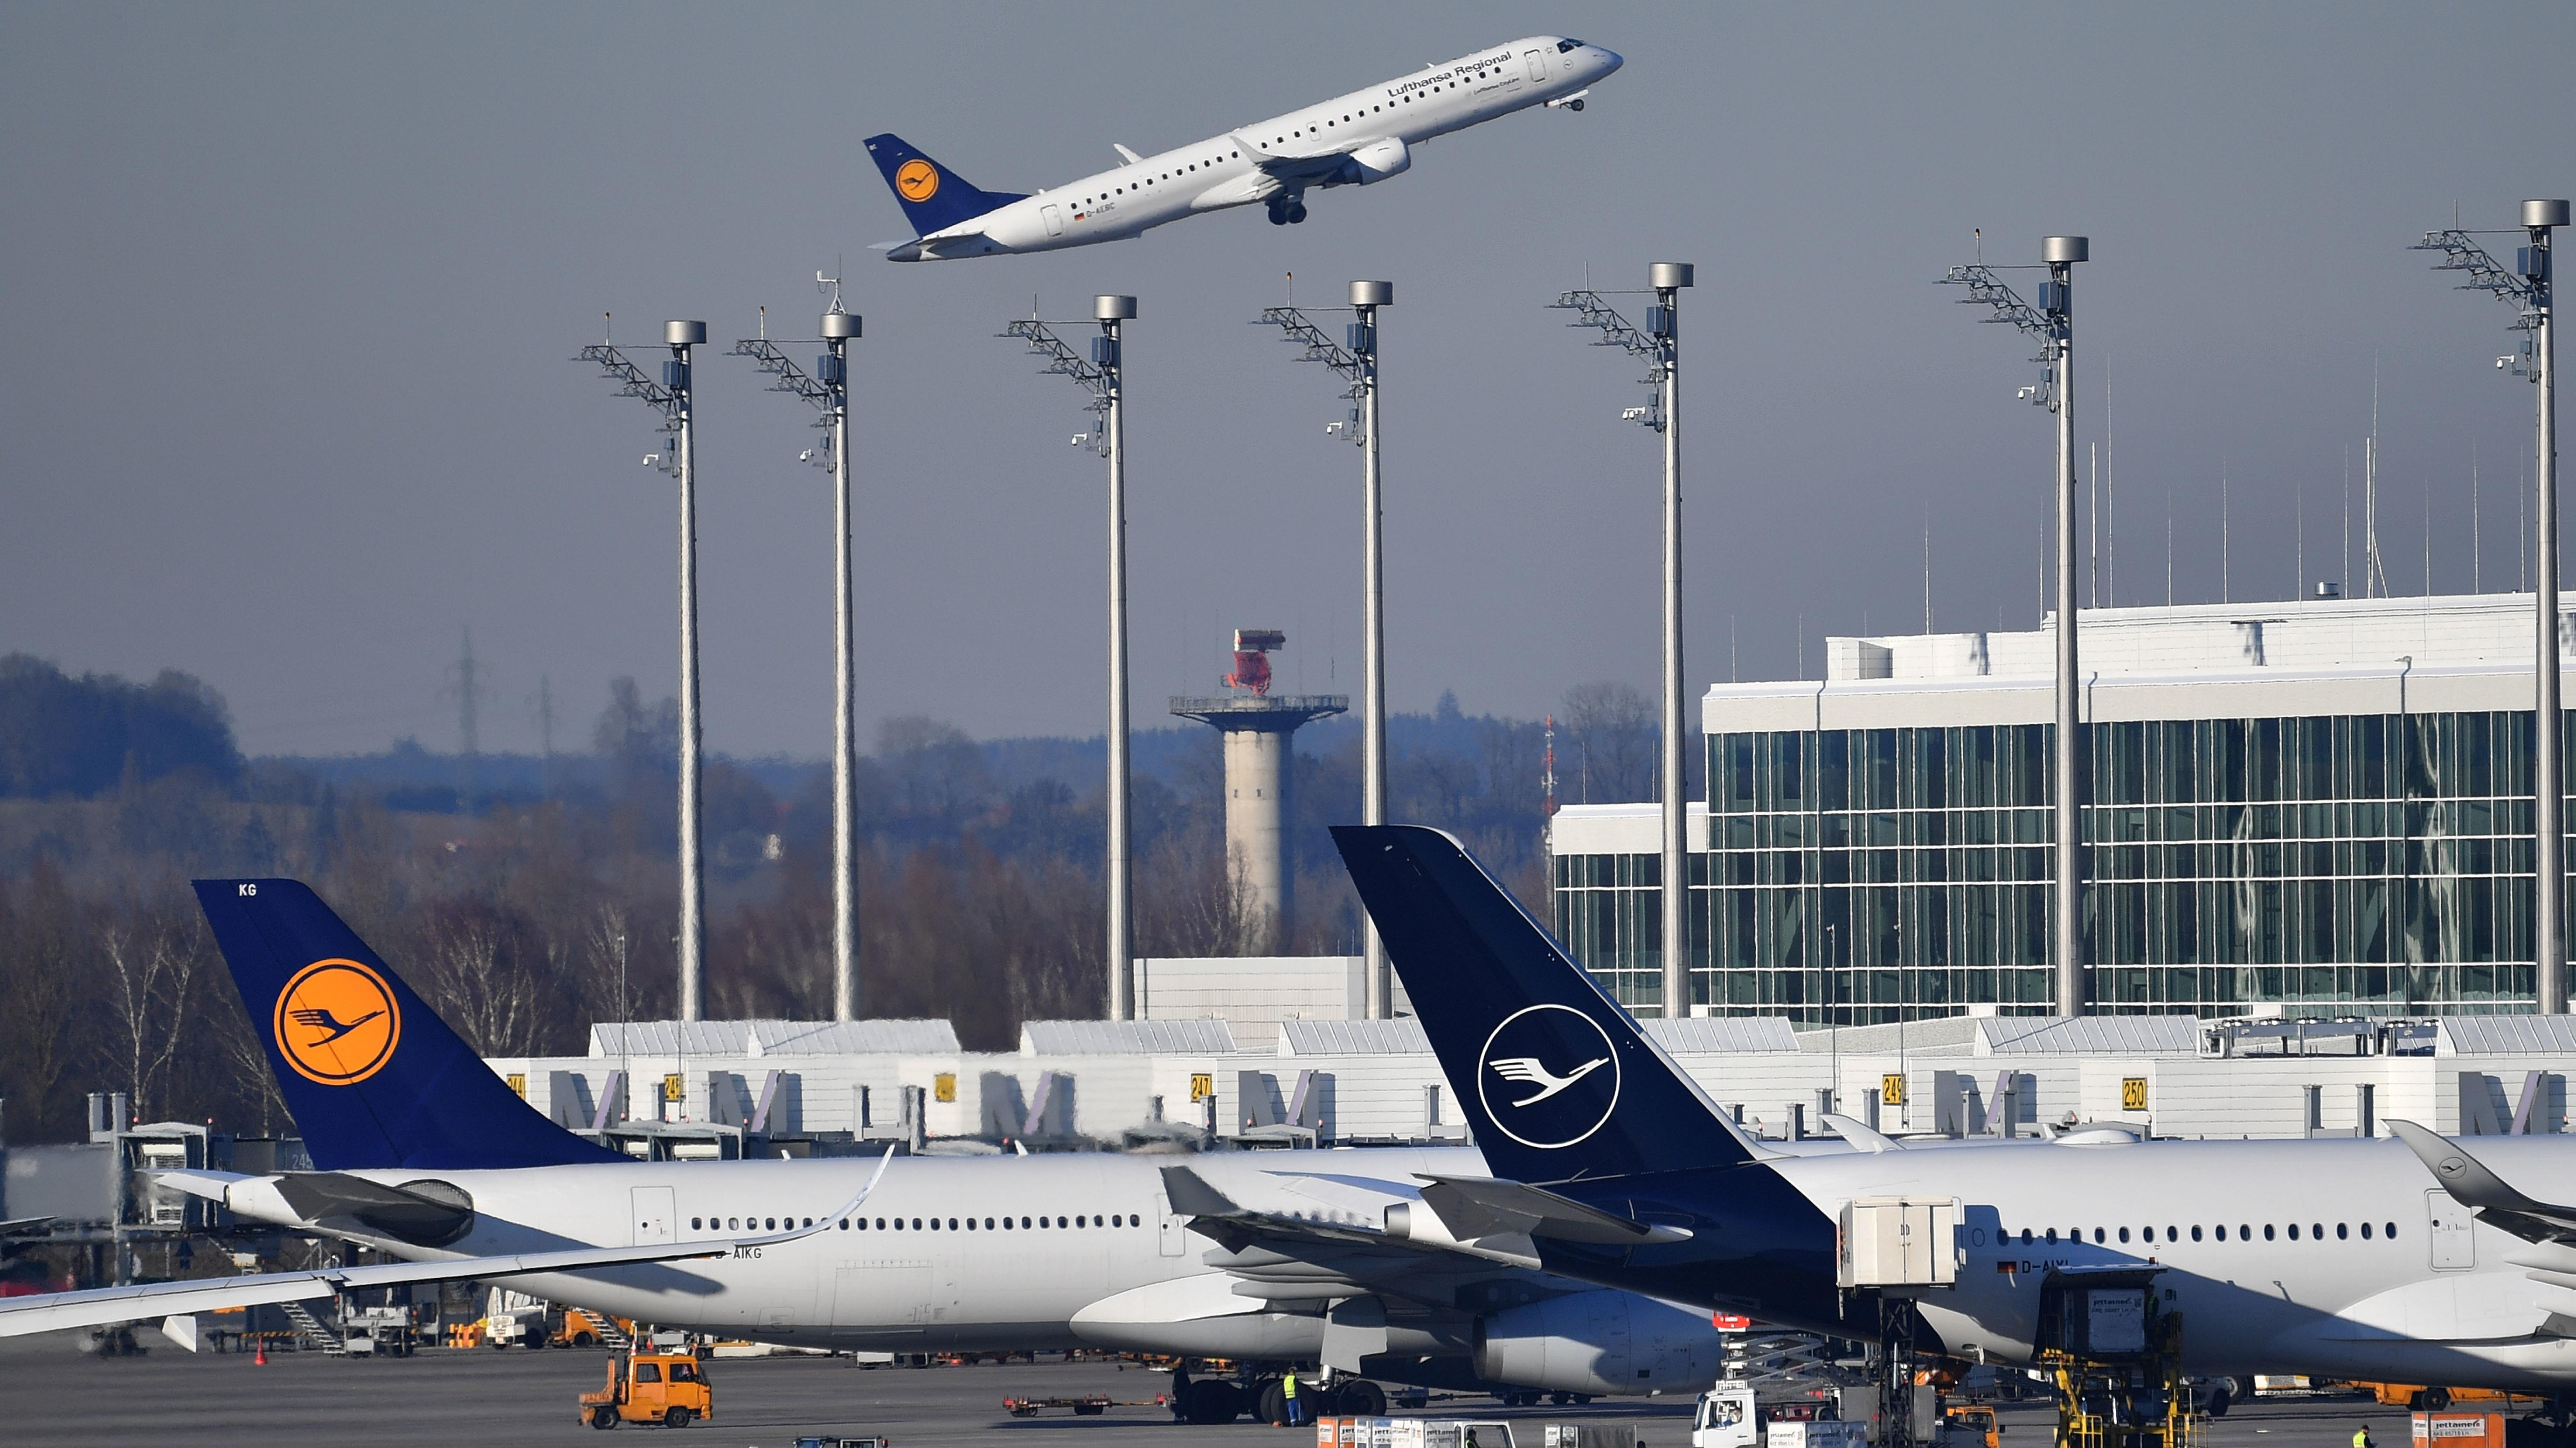 Flugzeuge am Münchner Flughafen